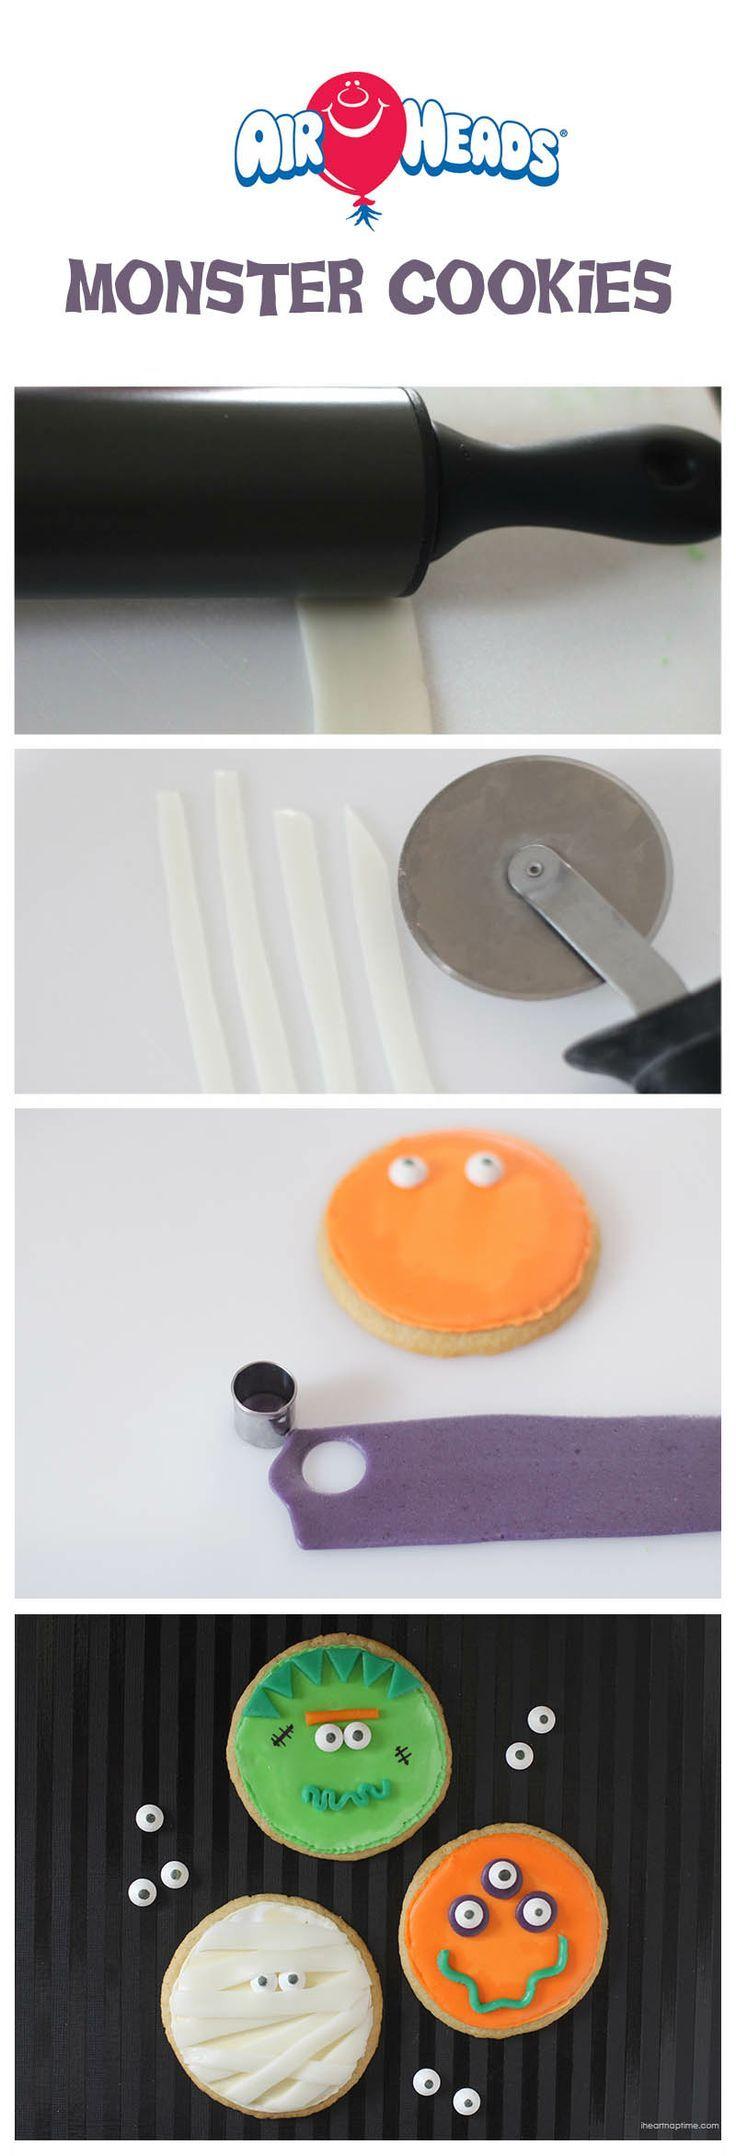 Monster Halloween Cookies: Airheads Monster Cookies